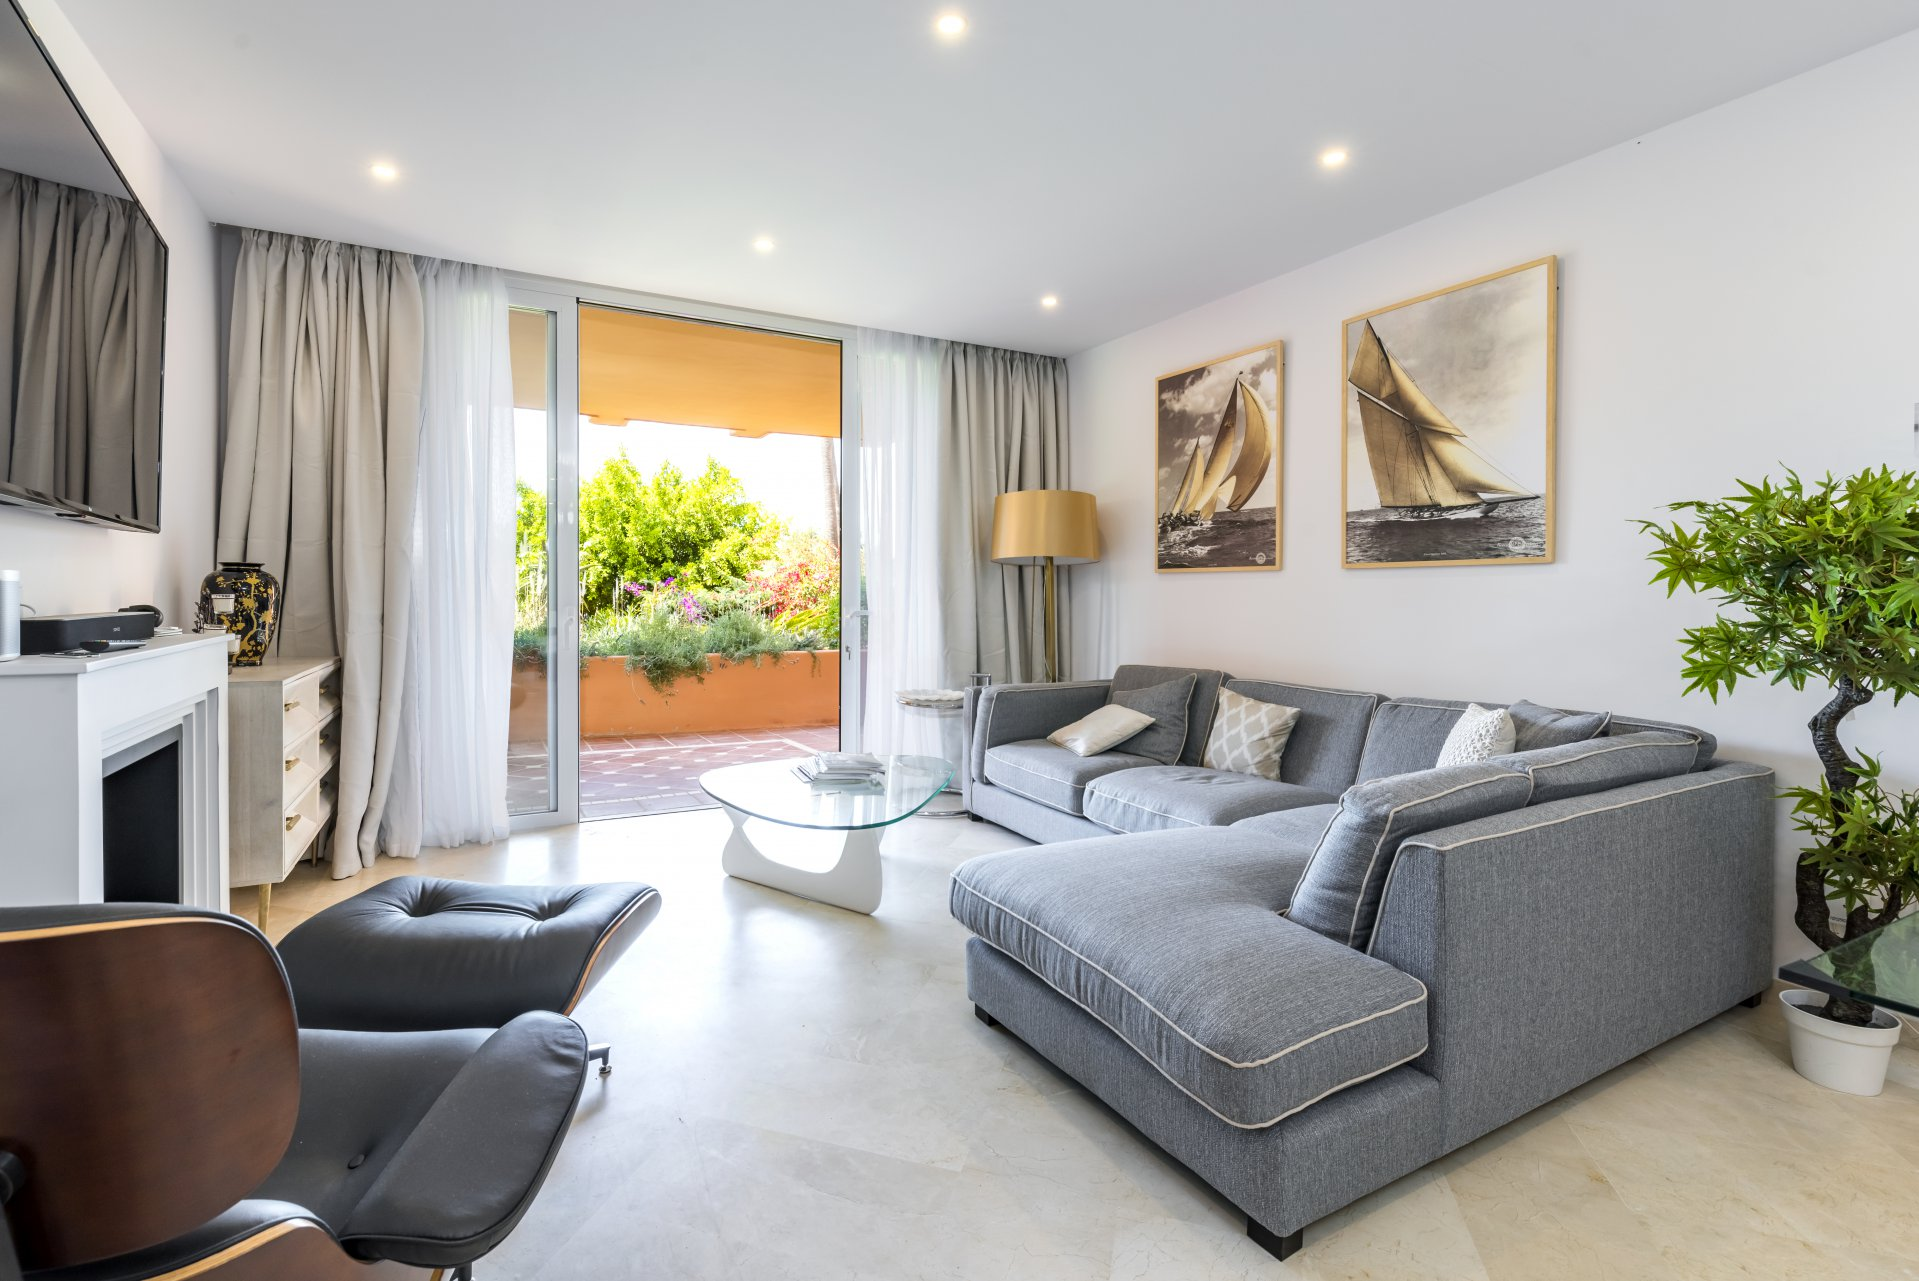 Ad Sale Apartment Santa Ponsa (07180), 3 Rooms ref:V0300SP